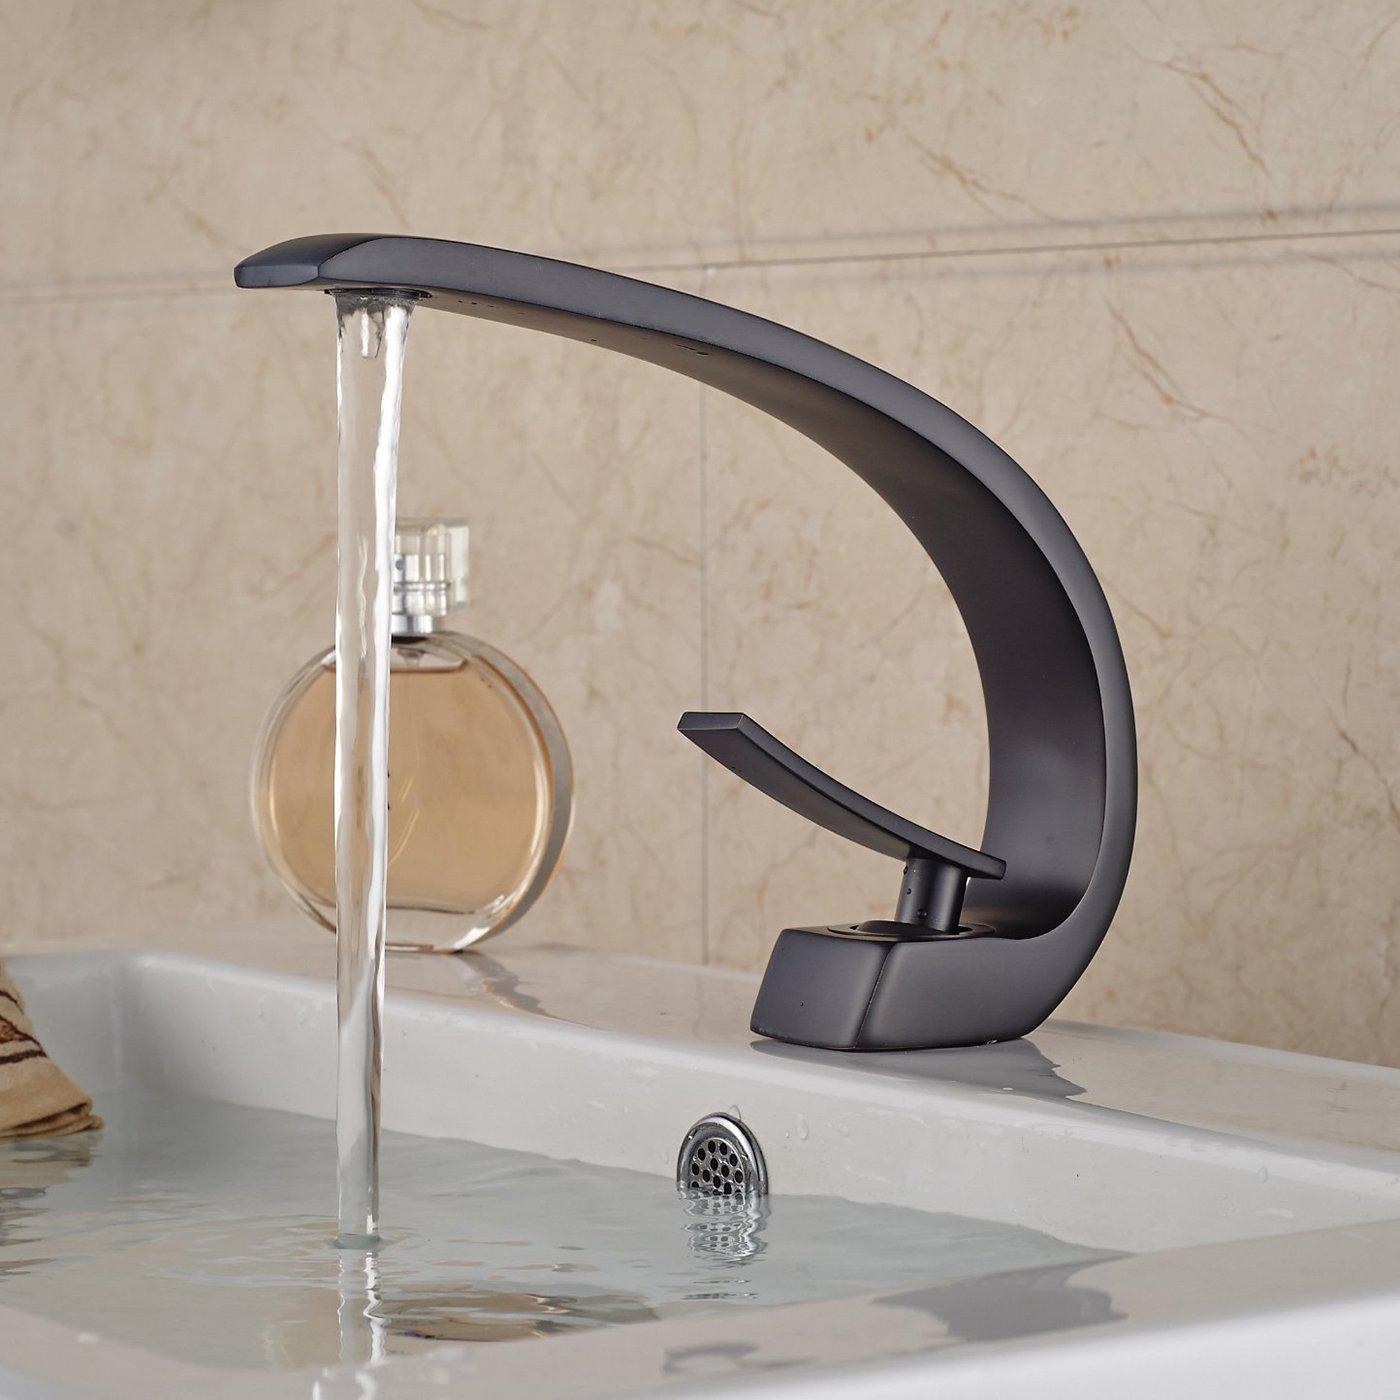 Robinet salle de bain Levier unique traditionnel Robinet lavabo Un ...